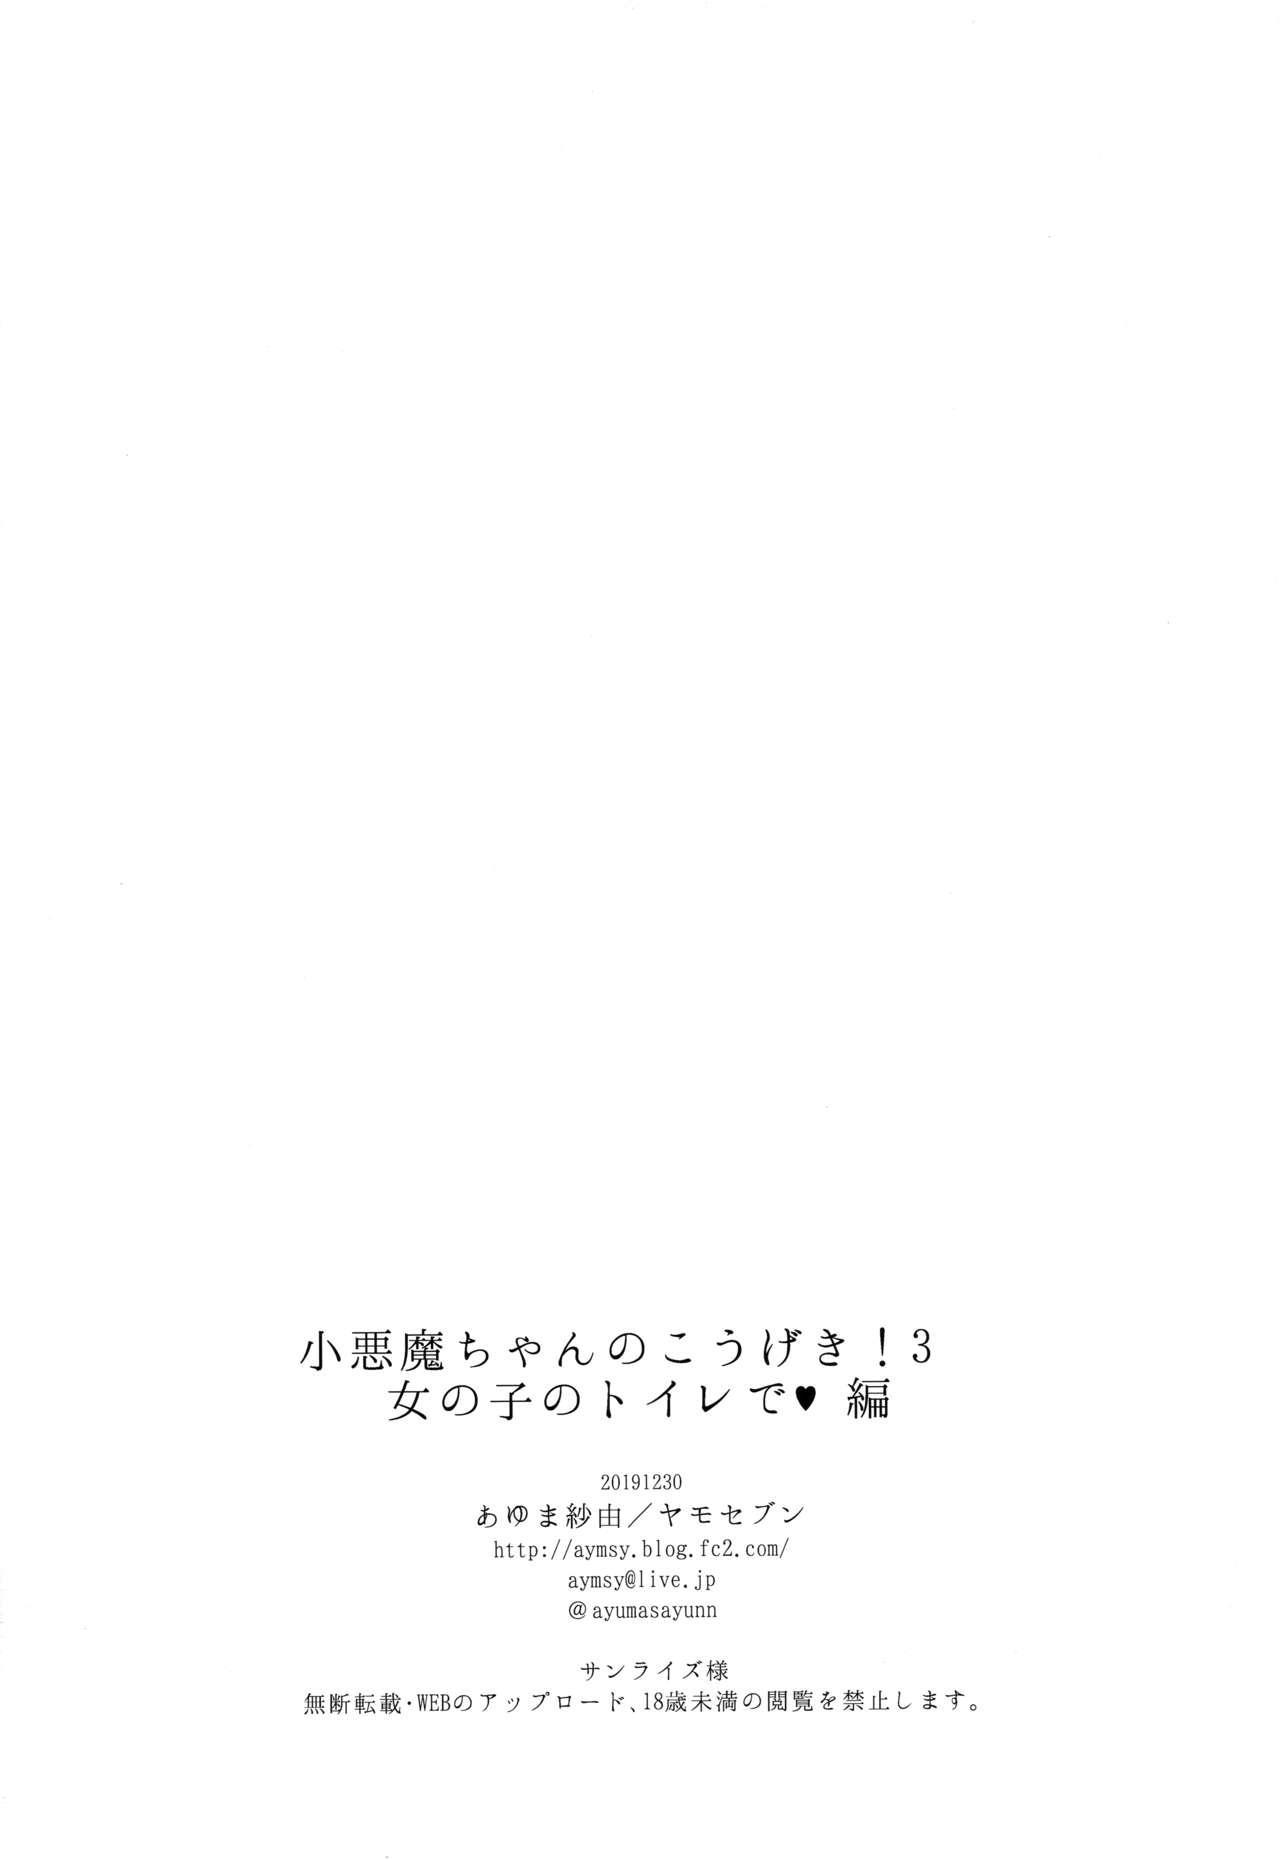 Koakuma-chan no Kougeki! 3 Onnanoko no toilet de Hen 25